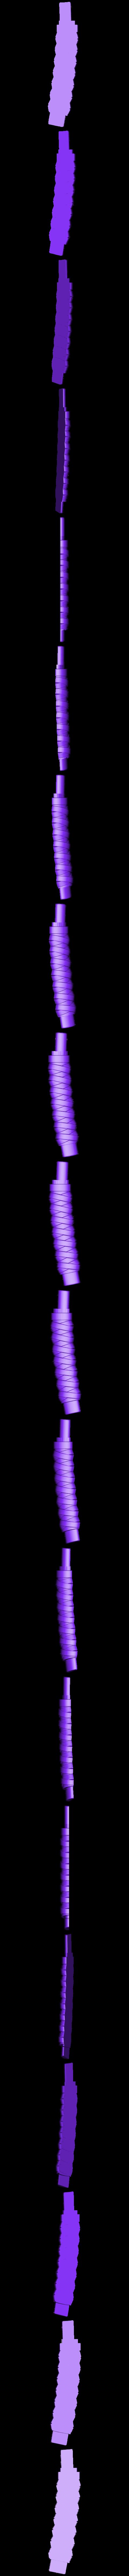 Katana_Handle_Right_Half.stl Download free STL file Training Mini Katana • 3D printer model, mrhers2